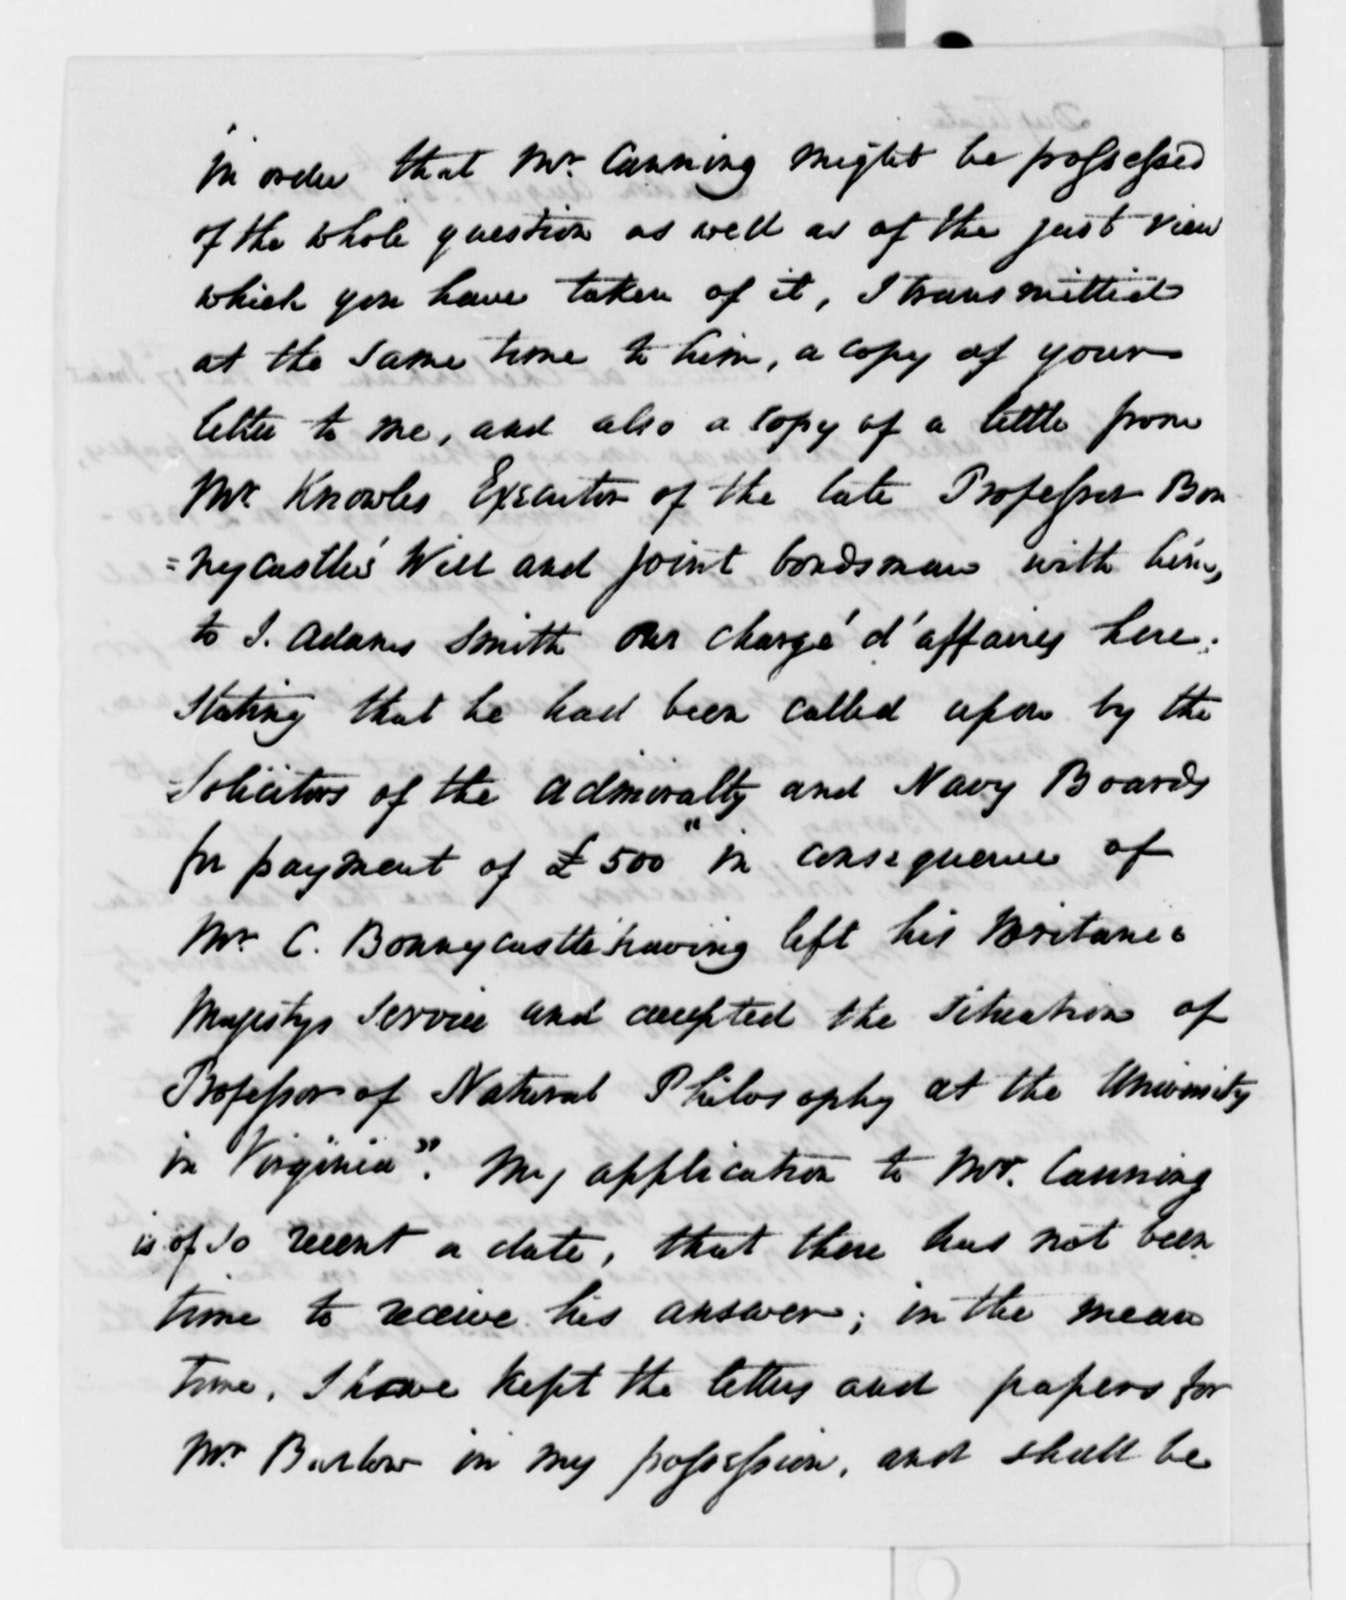 Rufus King to Thomas Jefferson, August 29, 1825